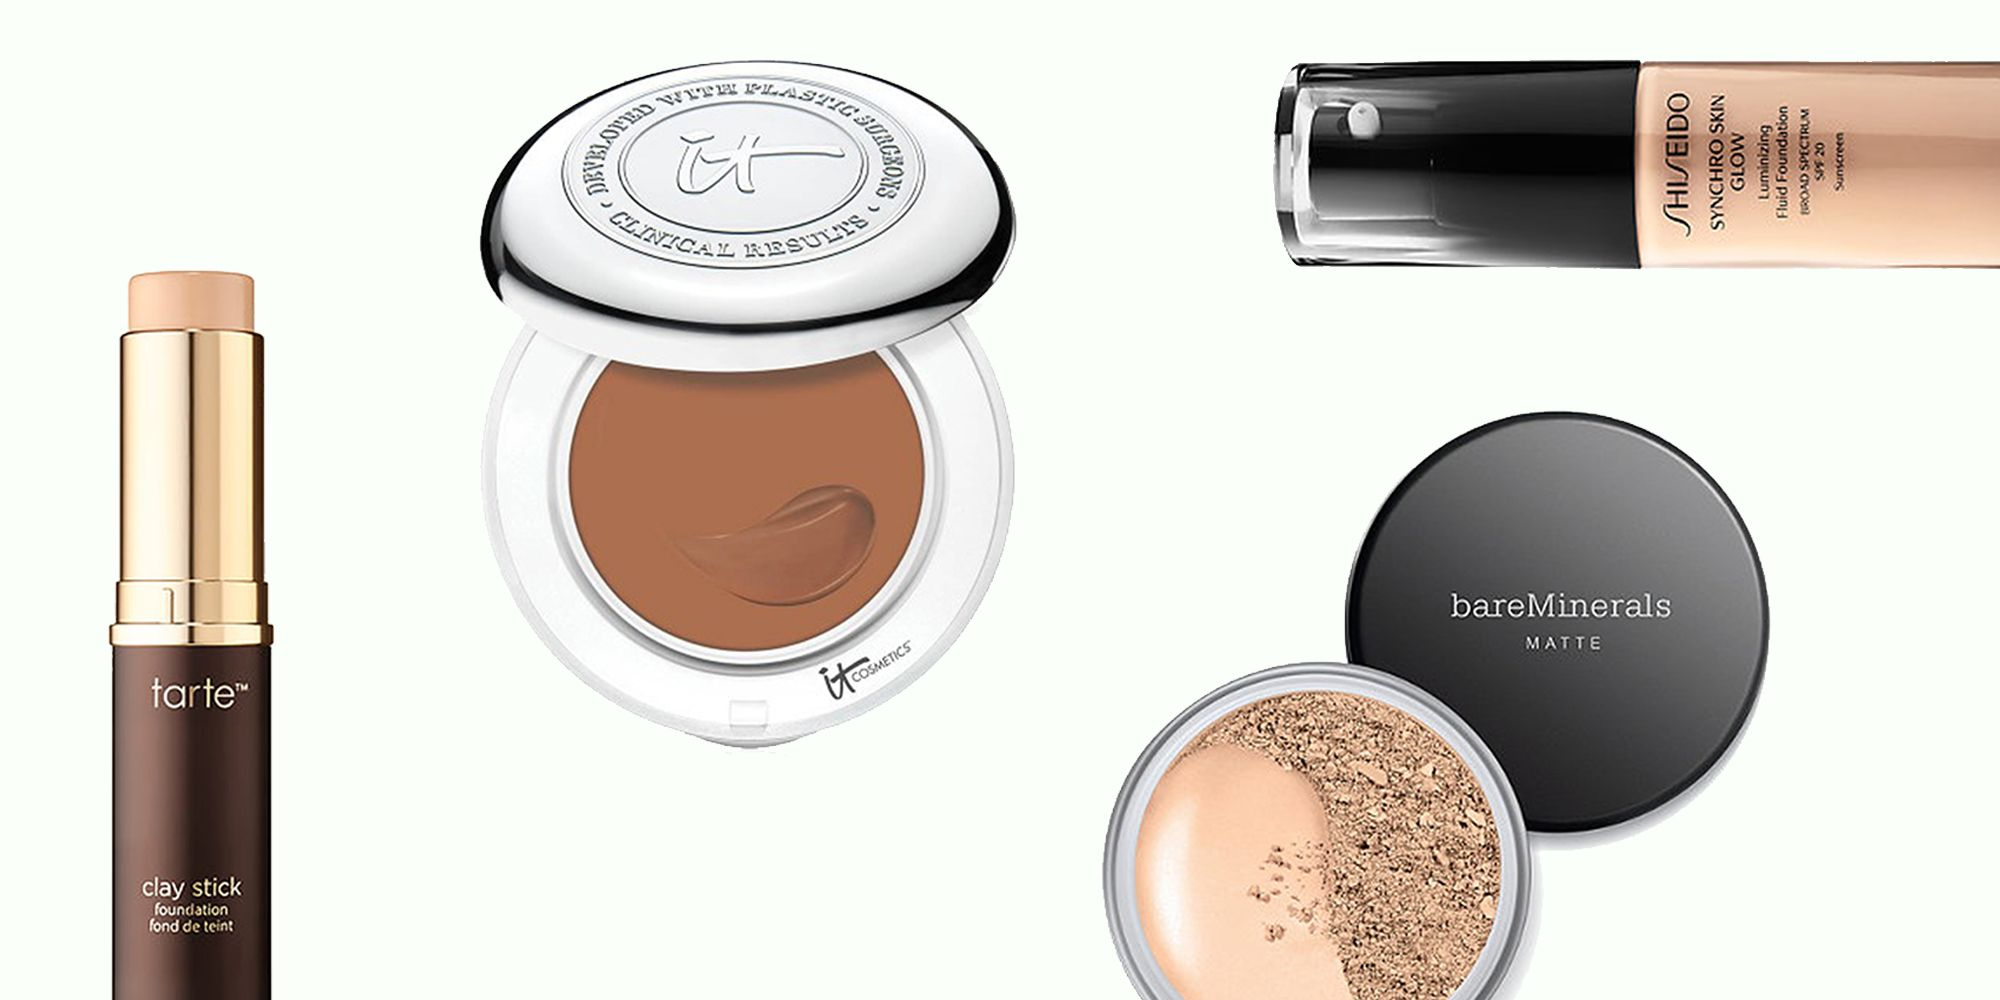 6 Best Foundation Picks For Sensitive Skin Gentle Foundation Makeup For Your Face